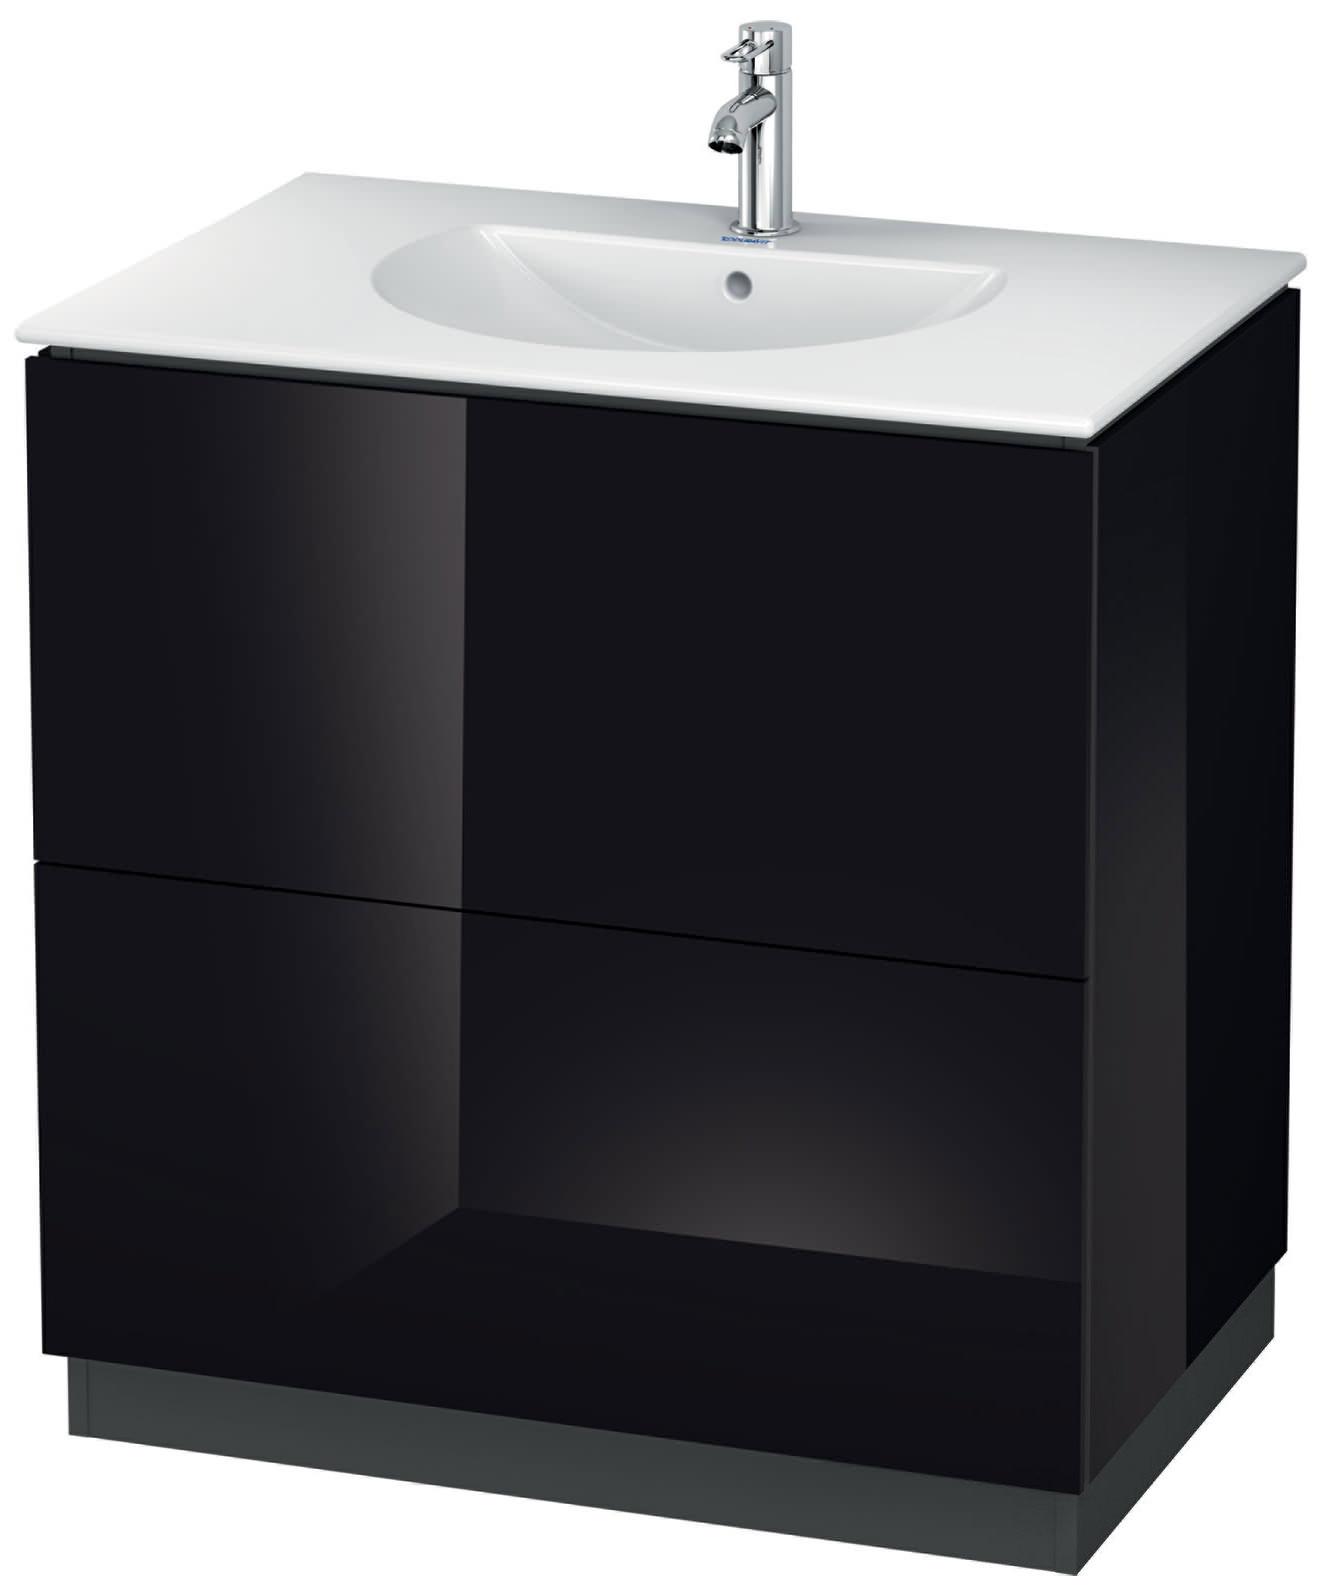 duravit l cube 820mm floor standing vanity unit with darling new basin. Black Bedroom Furniture Sets. Home Design Ideas